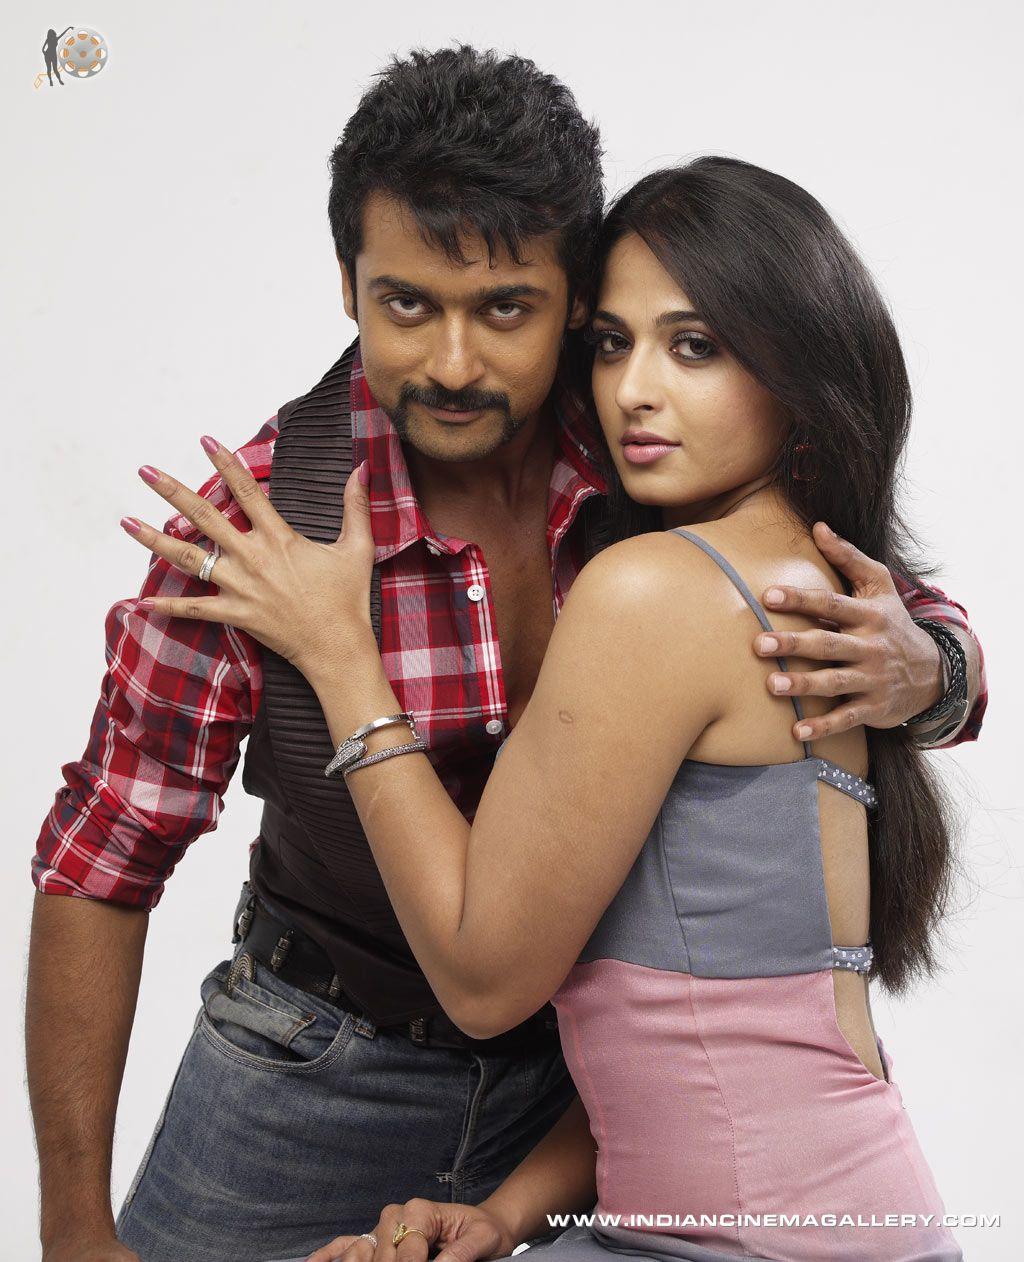 Murattu Kaalai Tamil Movie Stills: Indian Cinema Gallery: Tamil Movie Singam Photos Stills Images